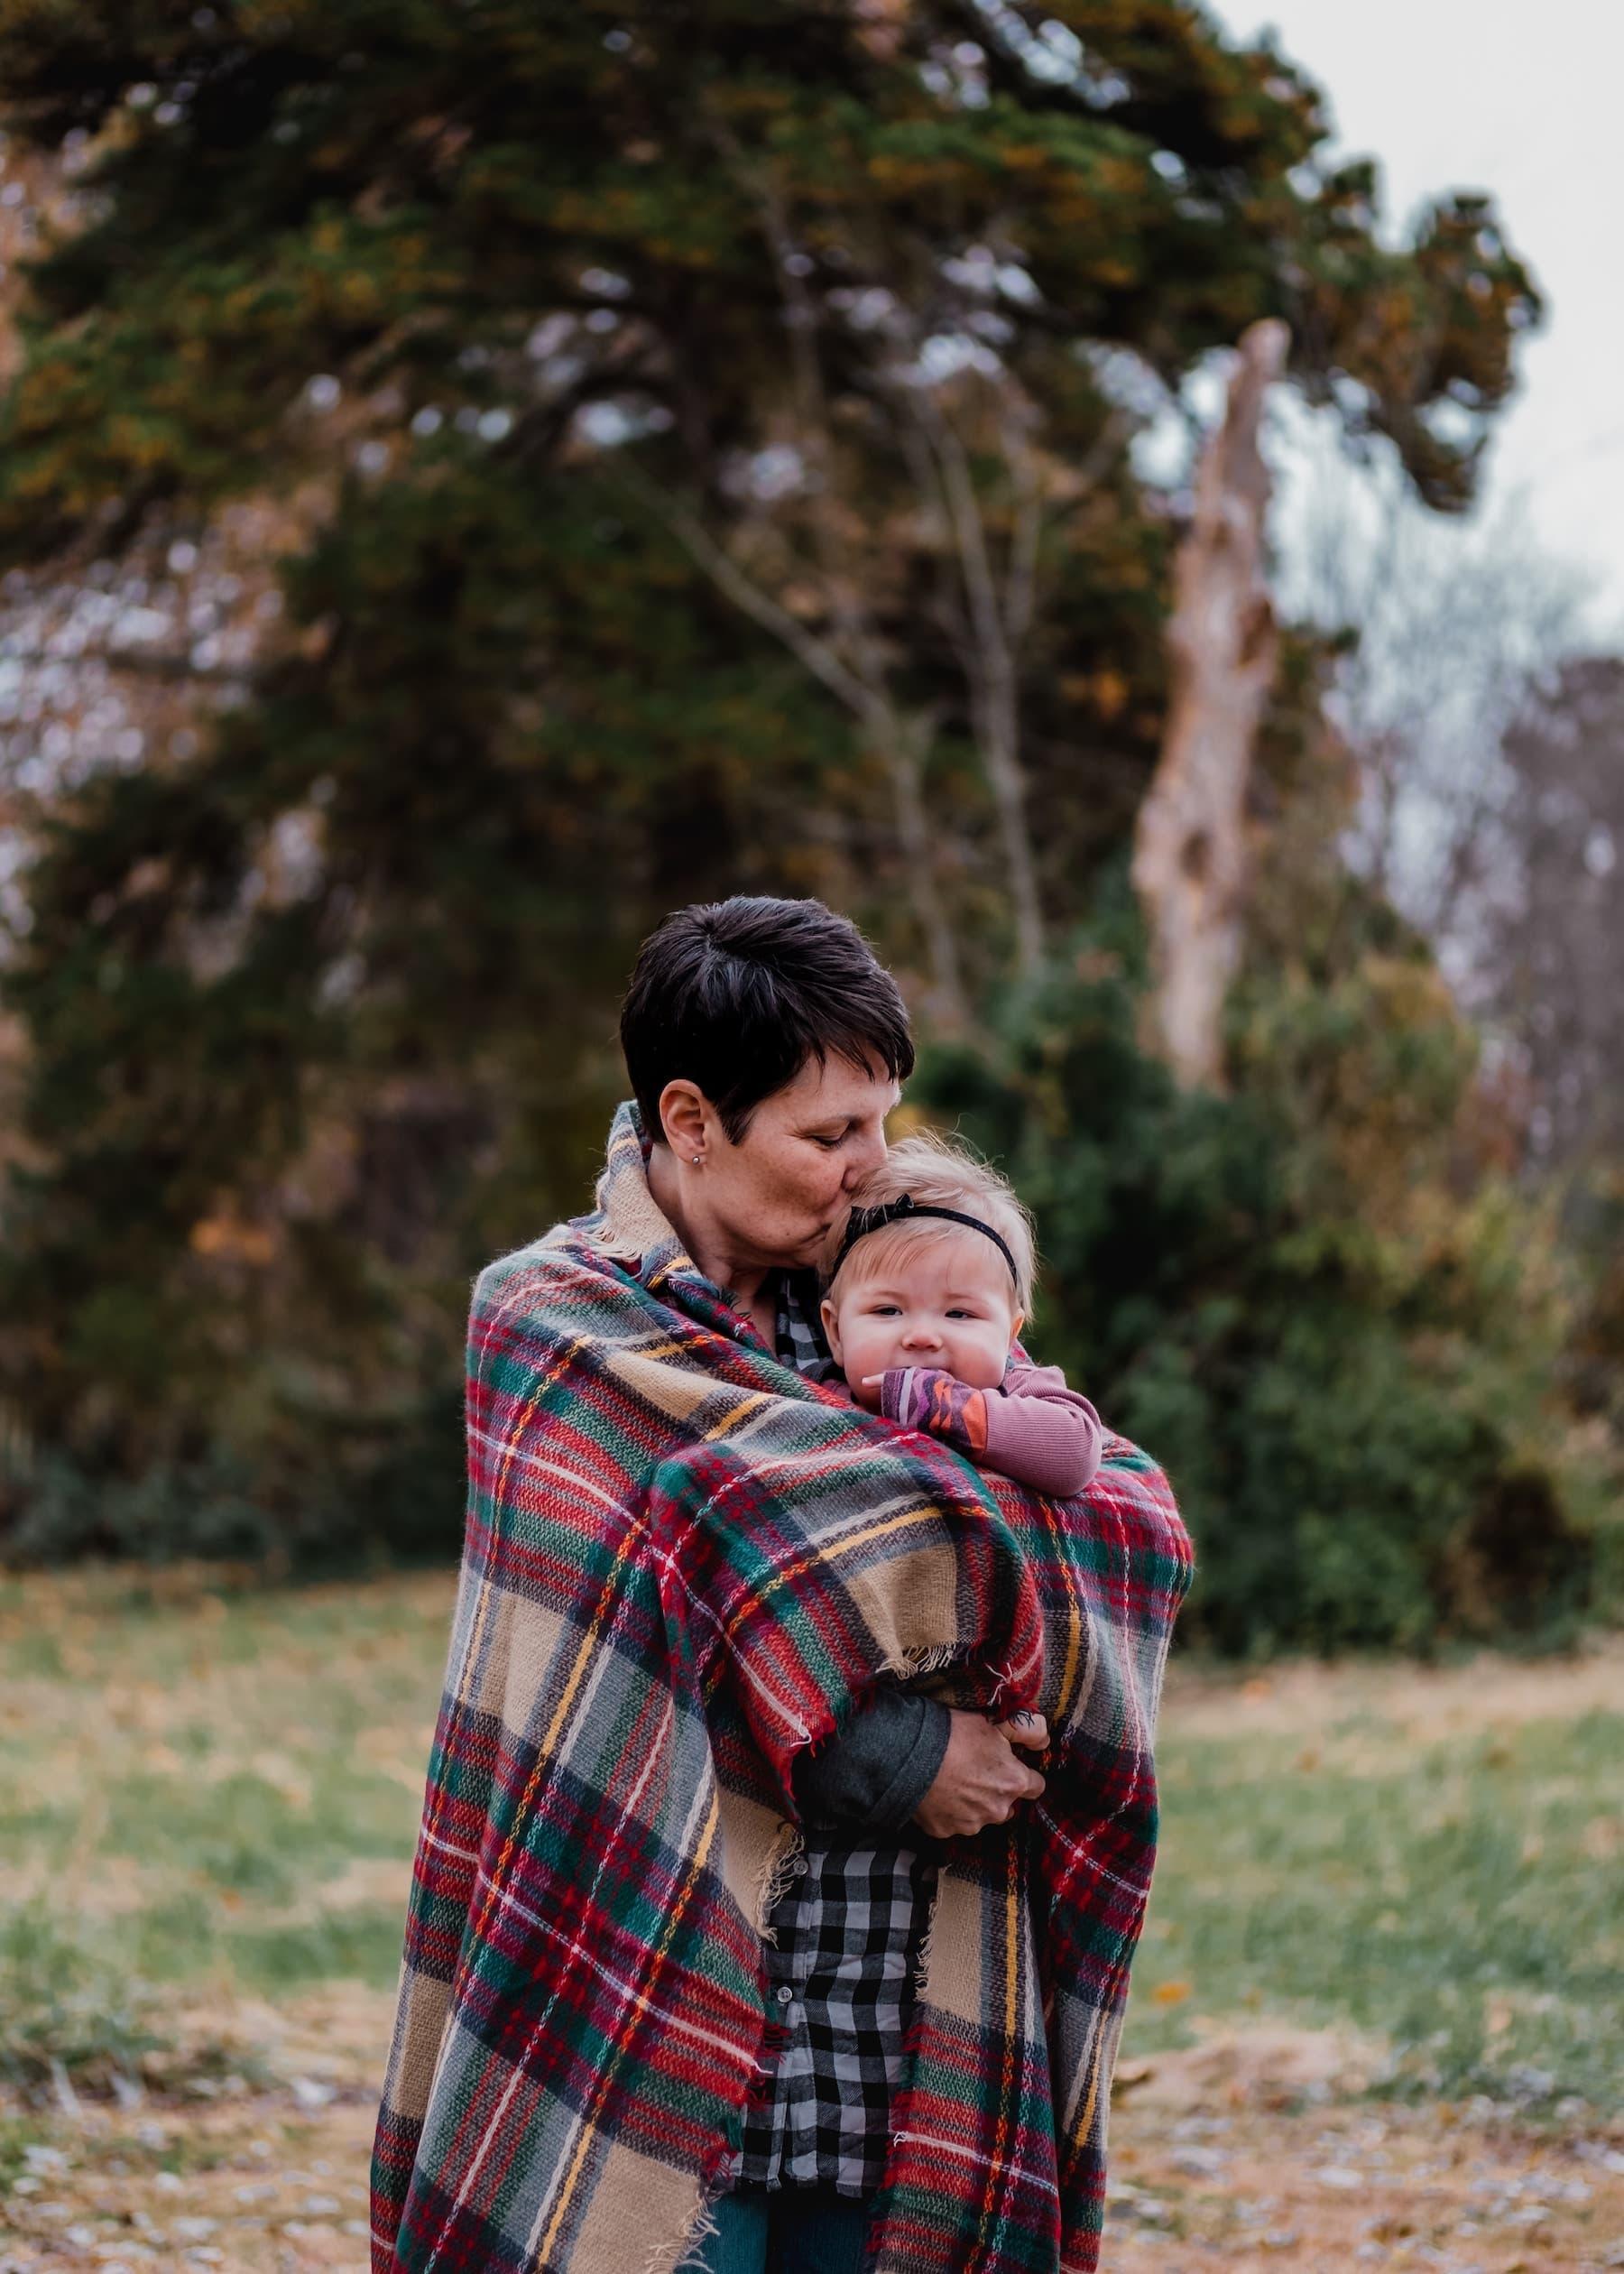 Mother hugging child, recipient of inheritance